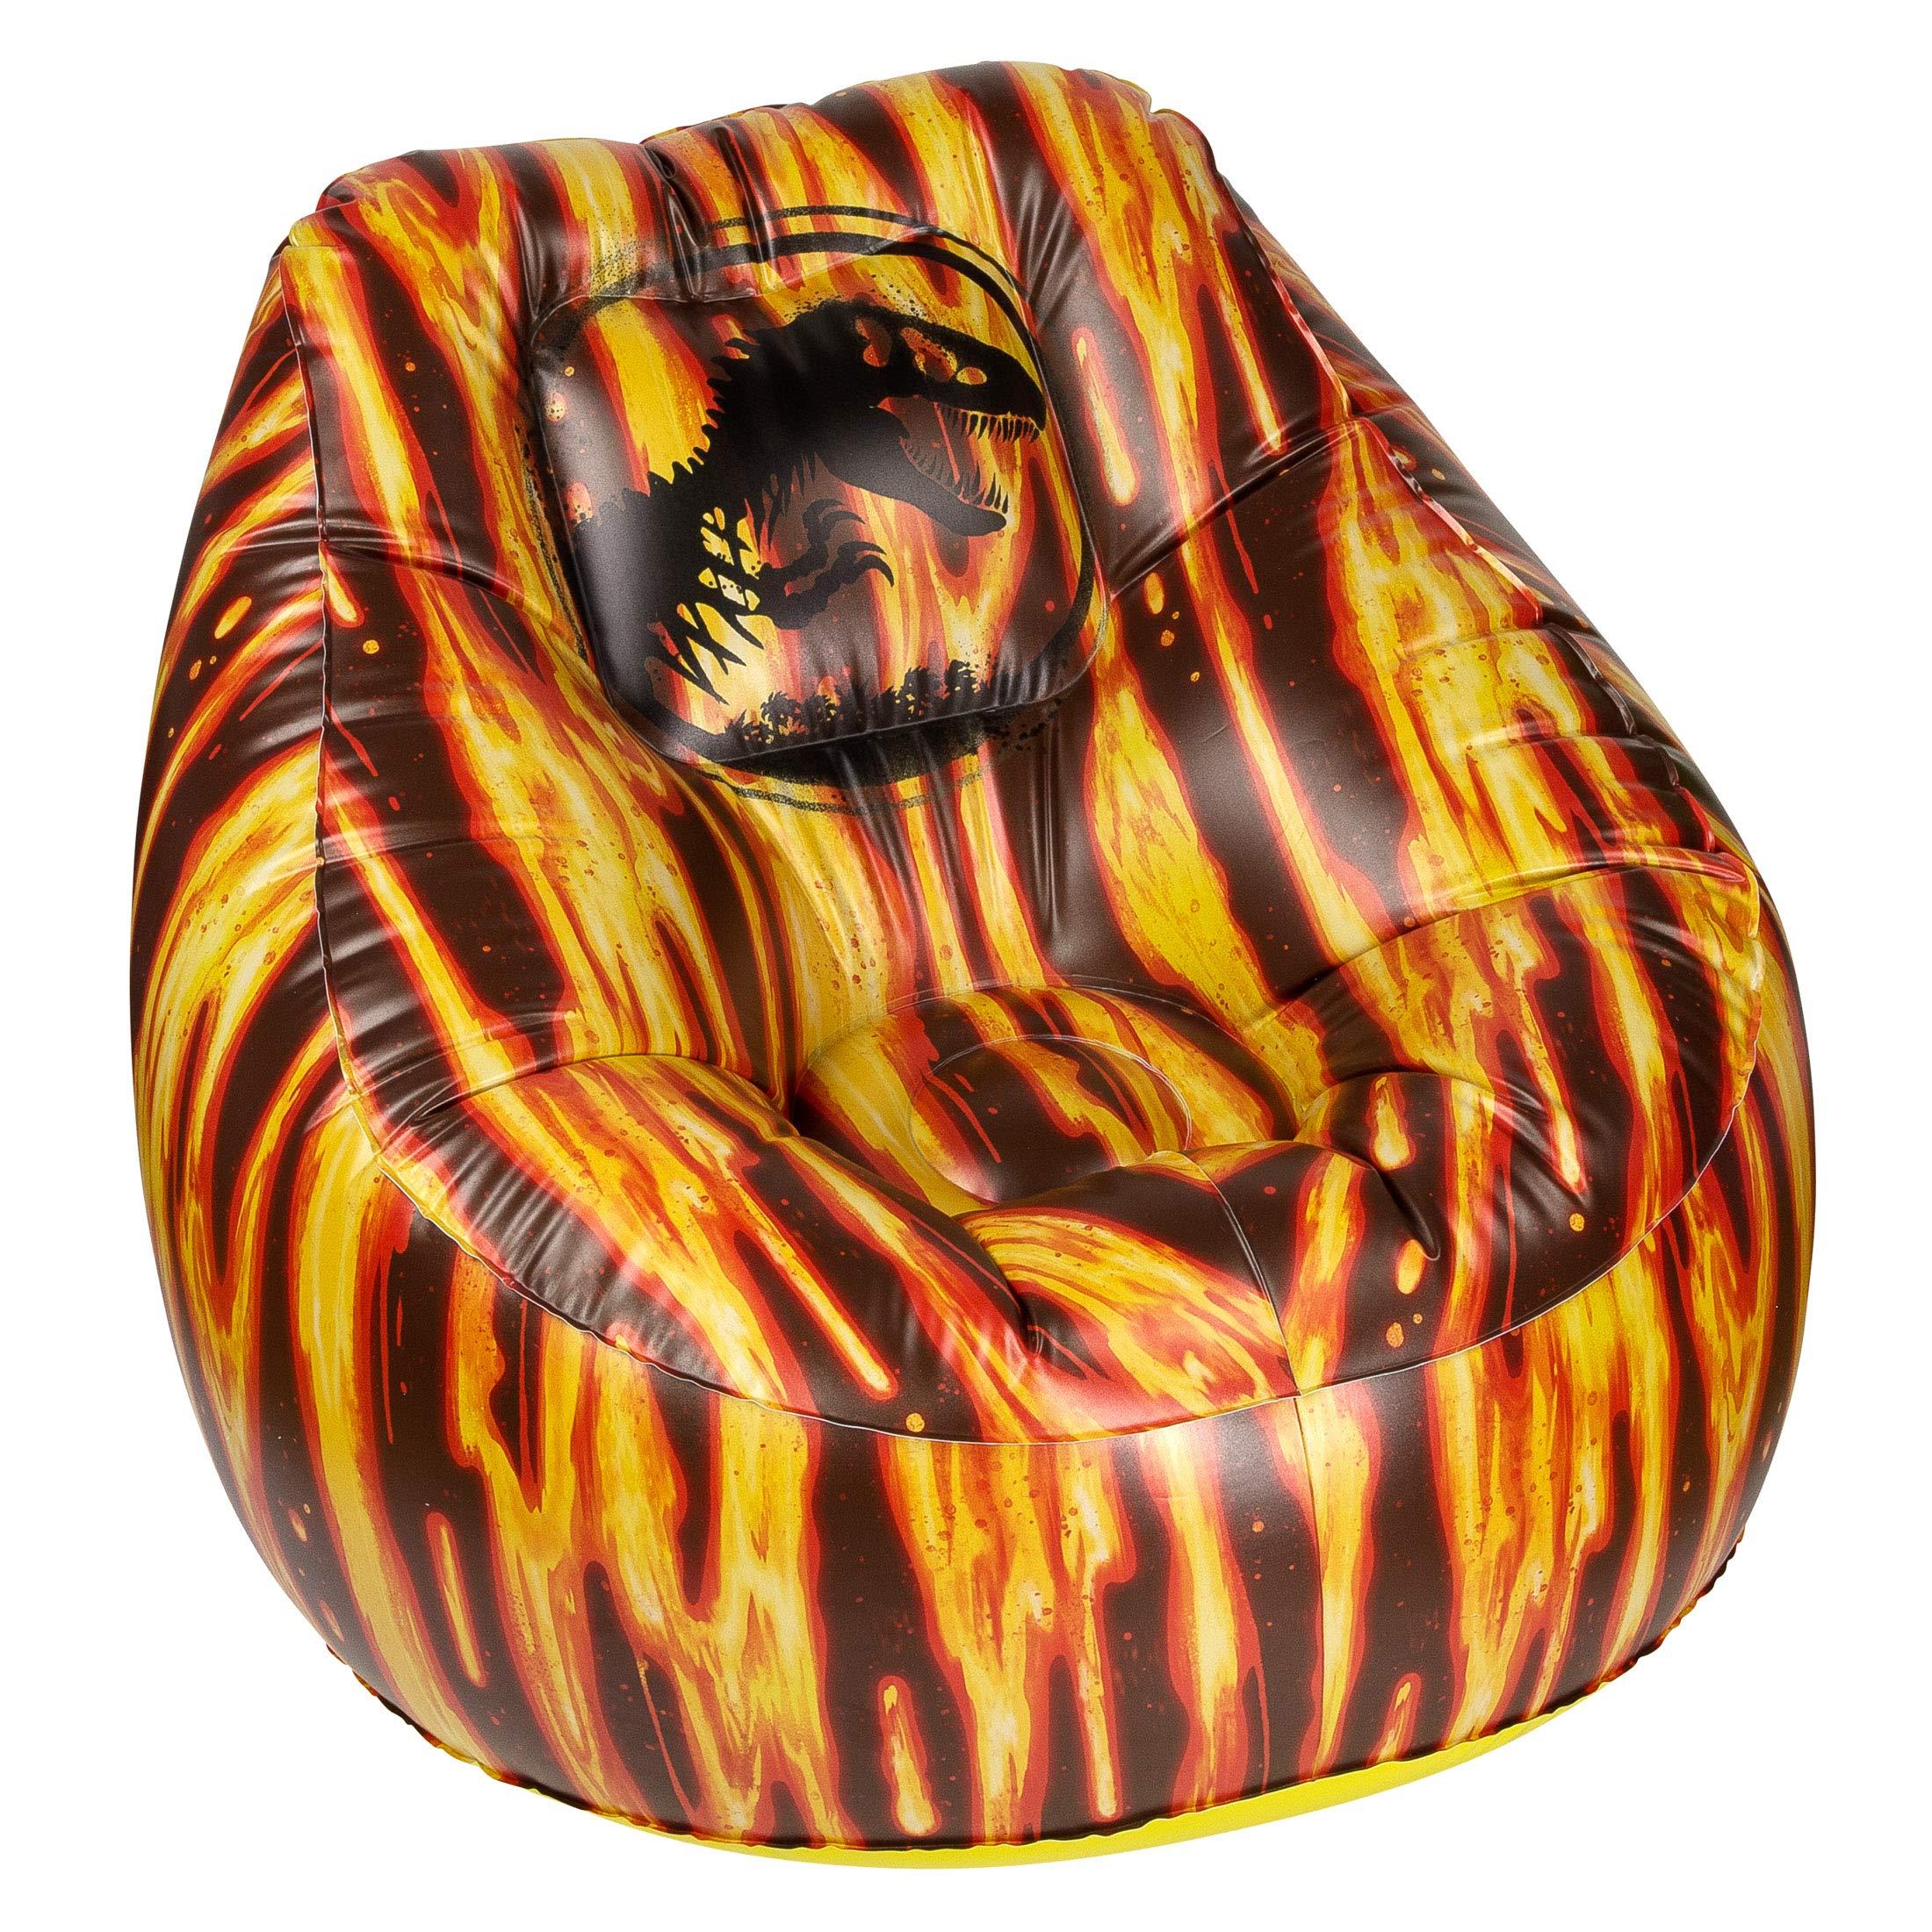 Jurassic World ANJW1082 Inflatable Chair, 23''x30''x30'', Multi